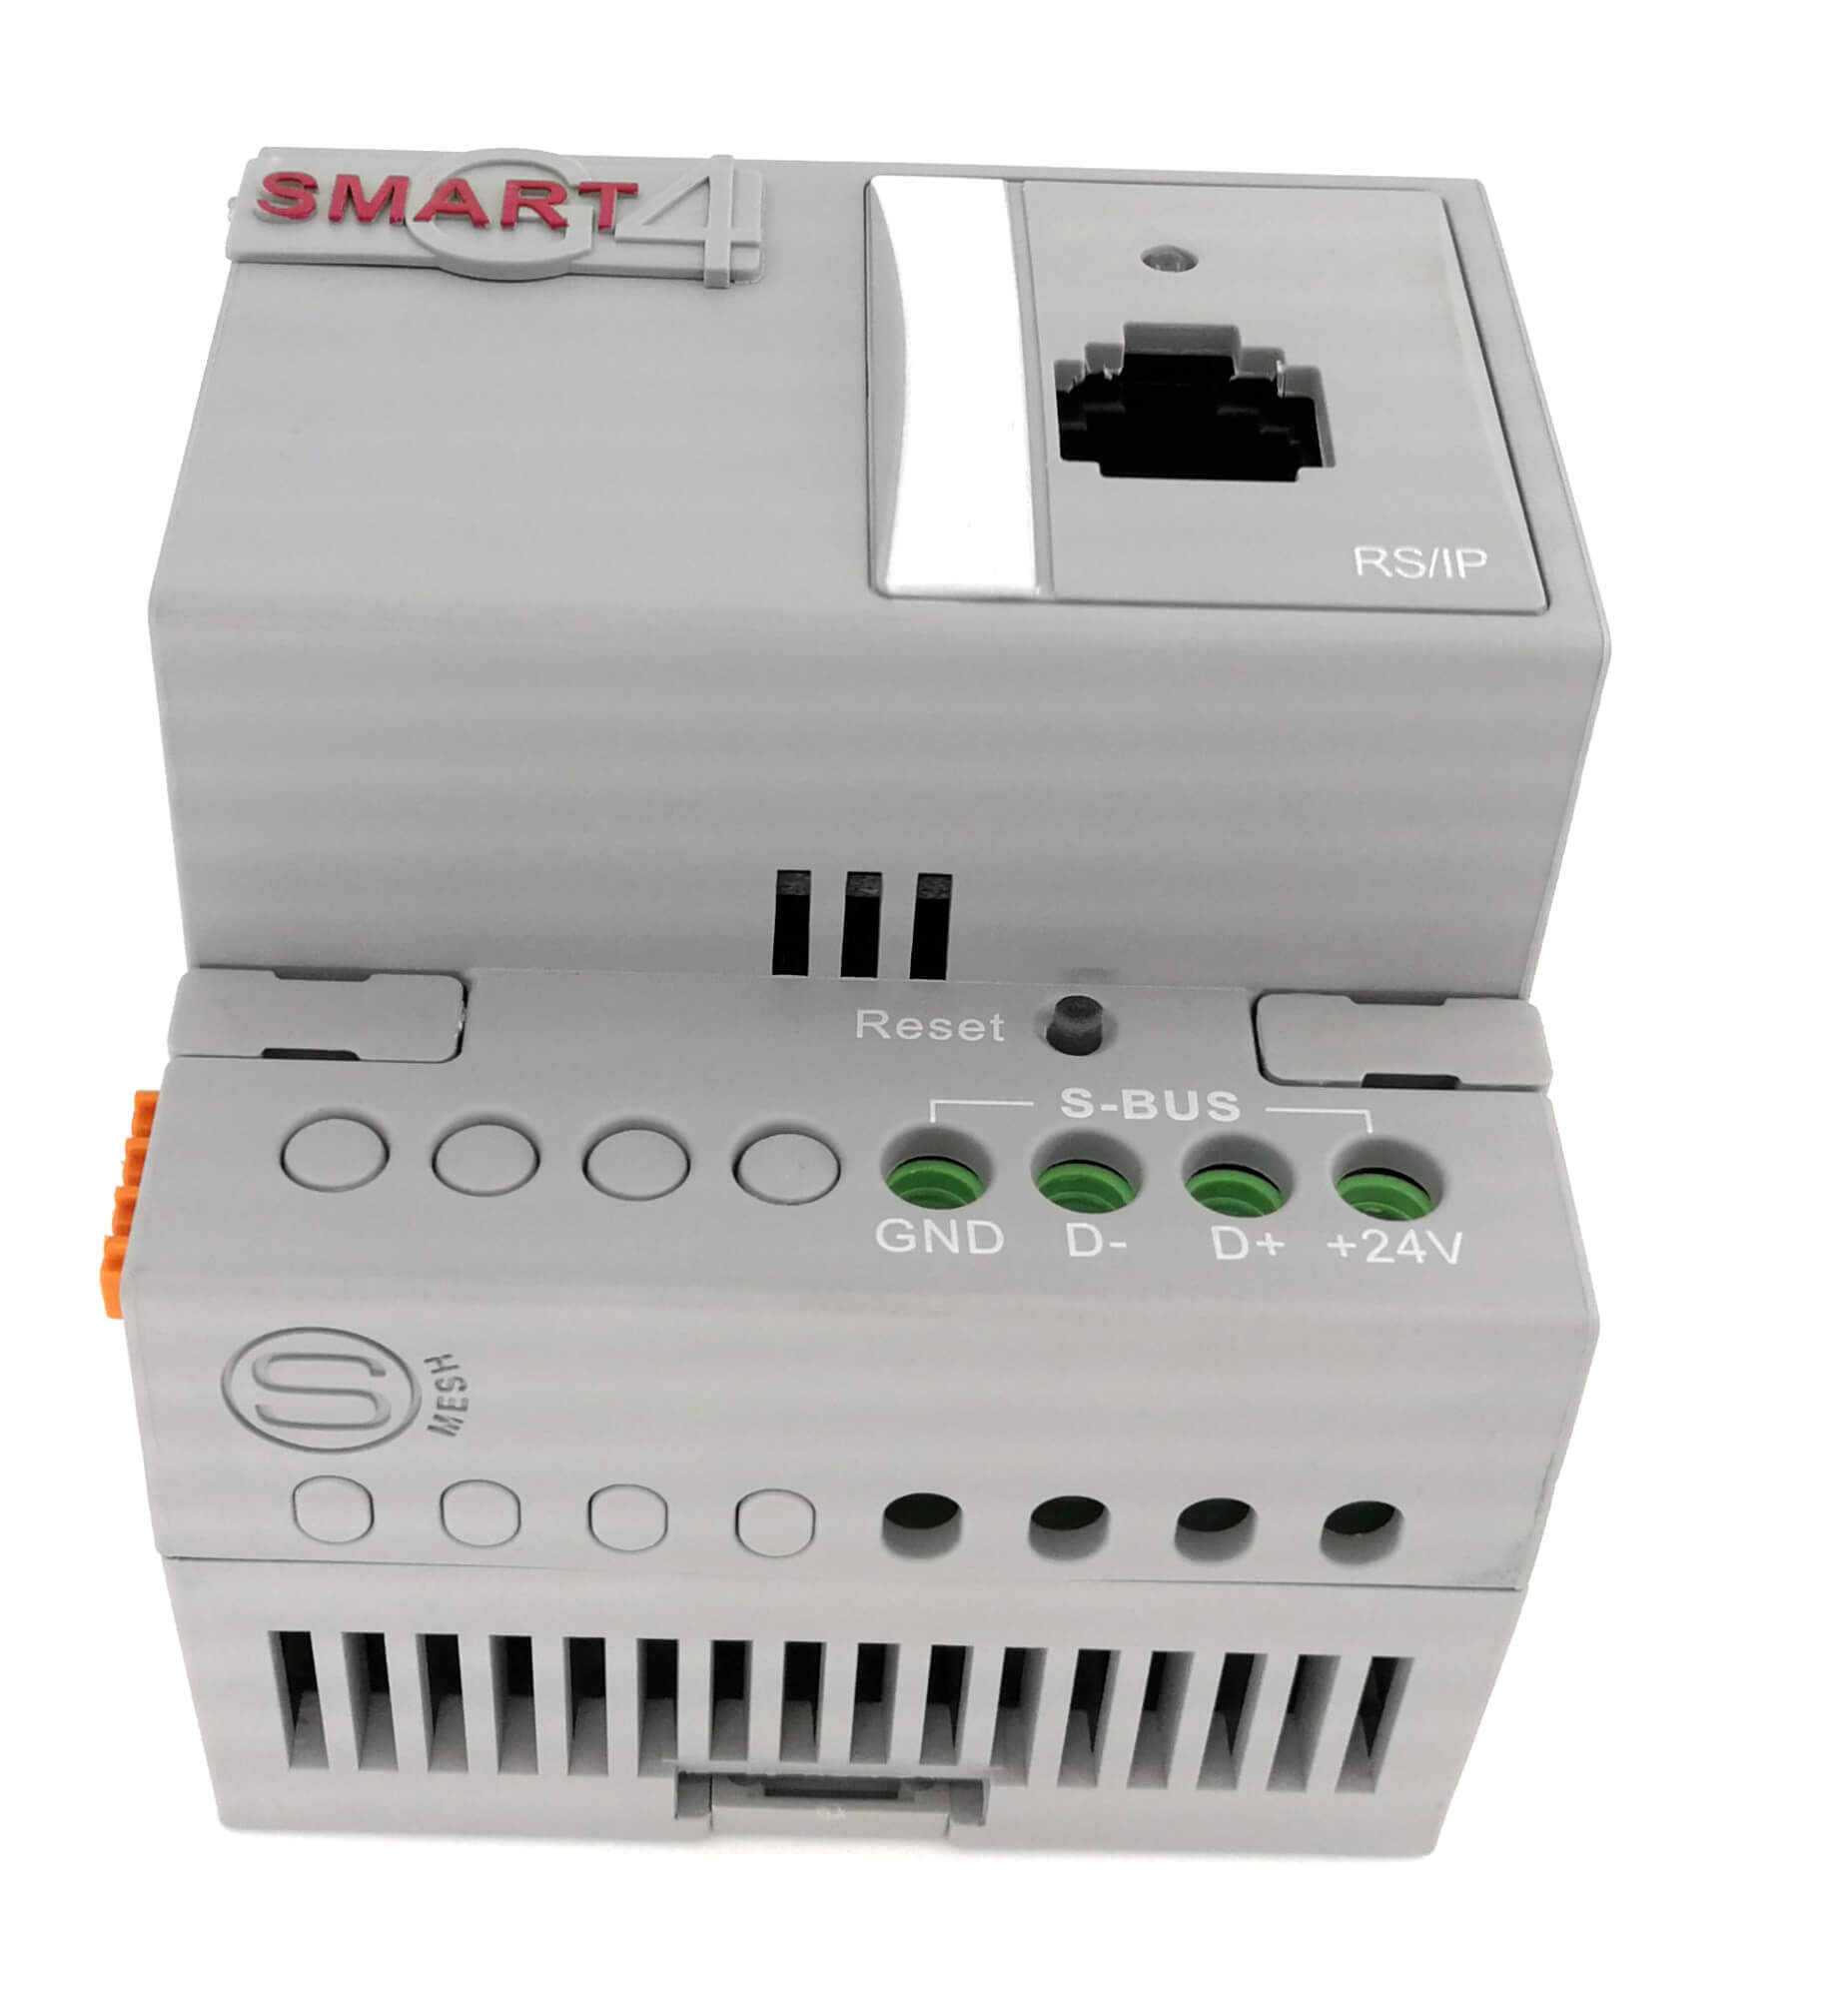 SmartHome-Israel - RsIp (1)